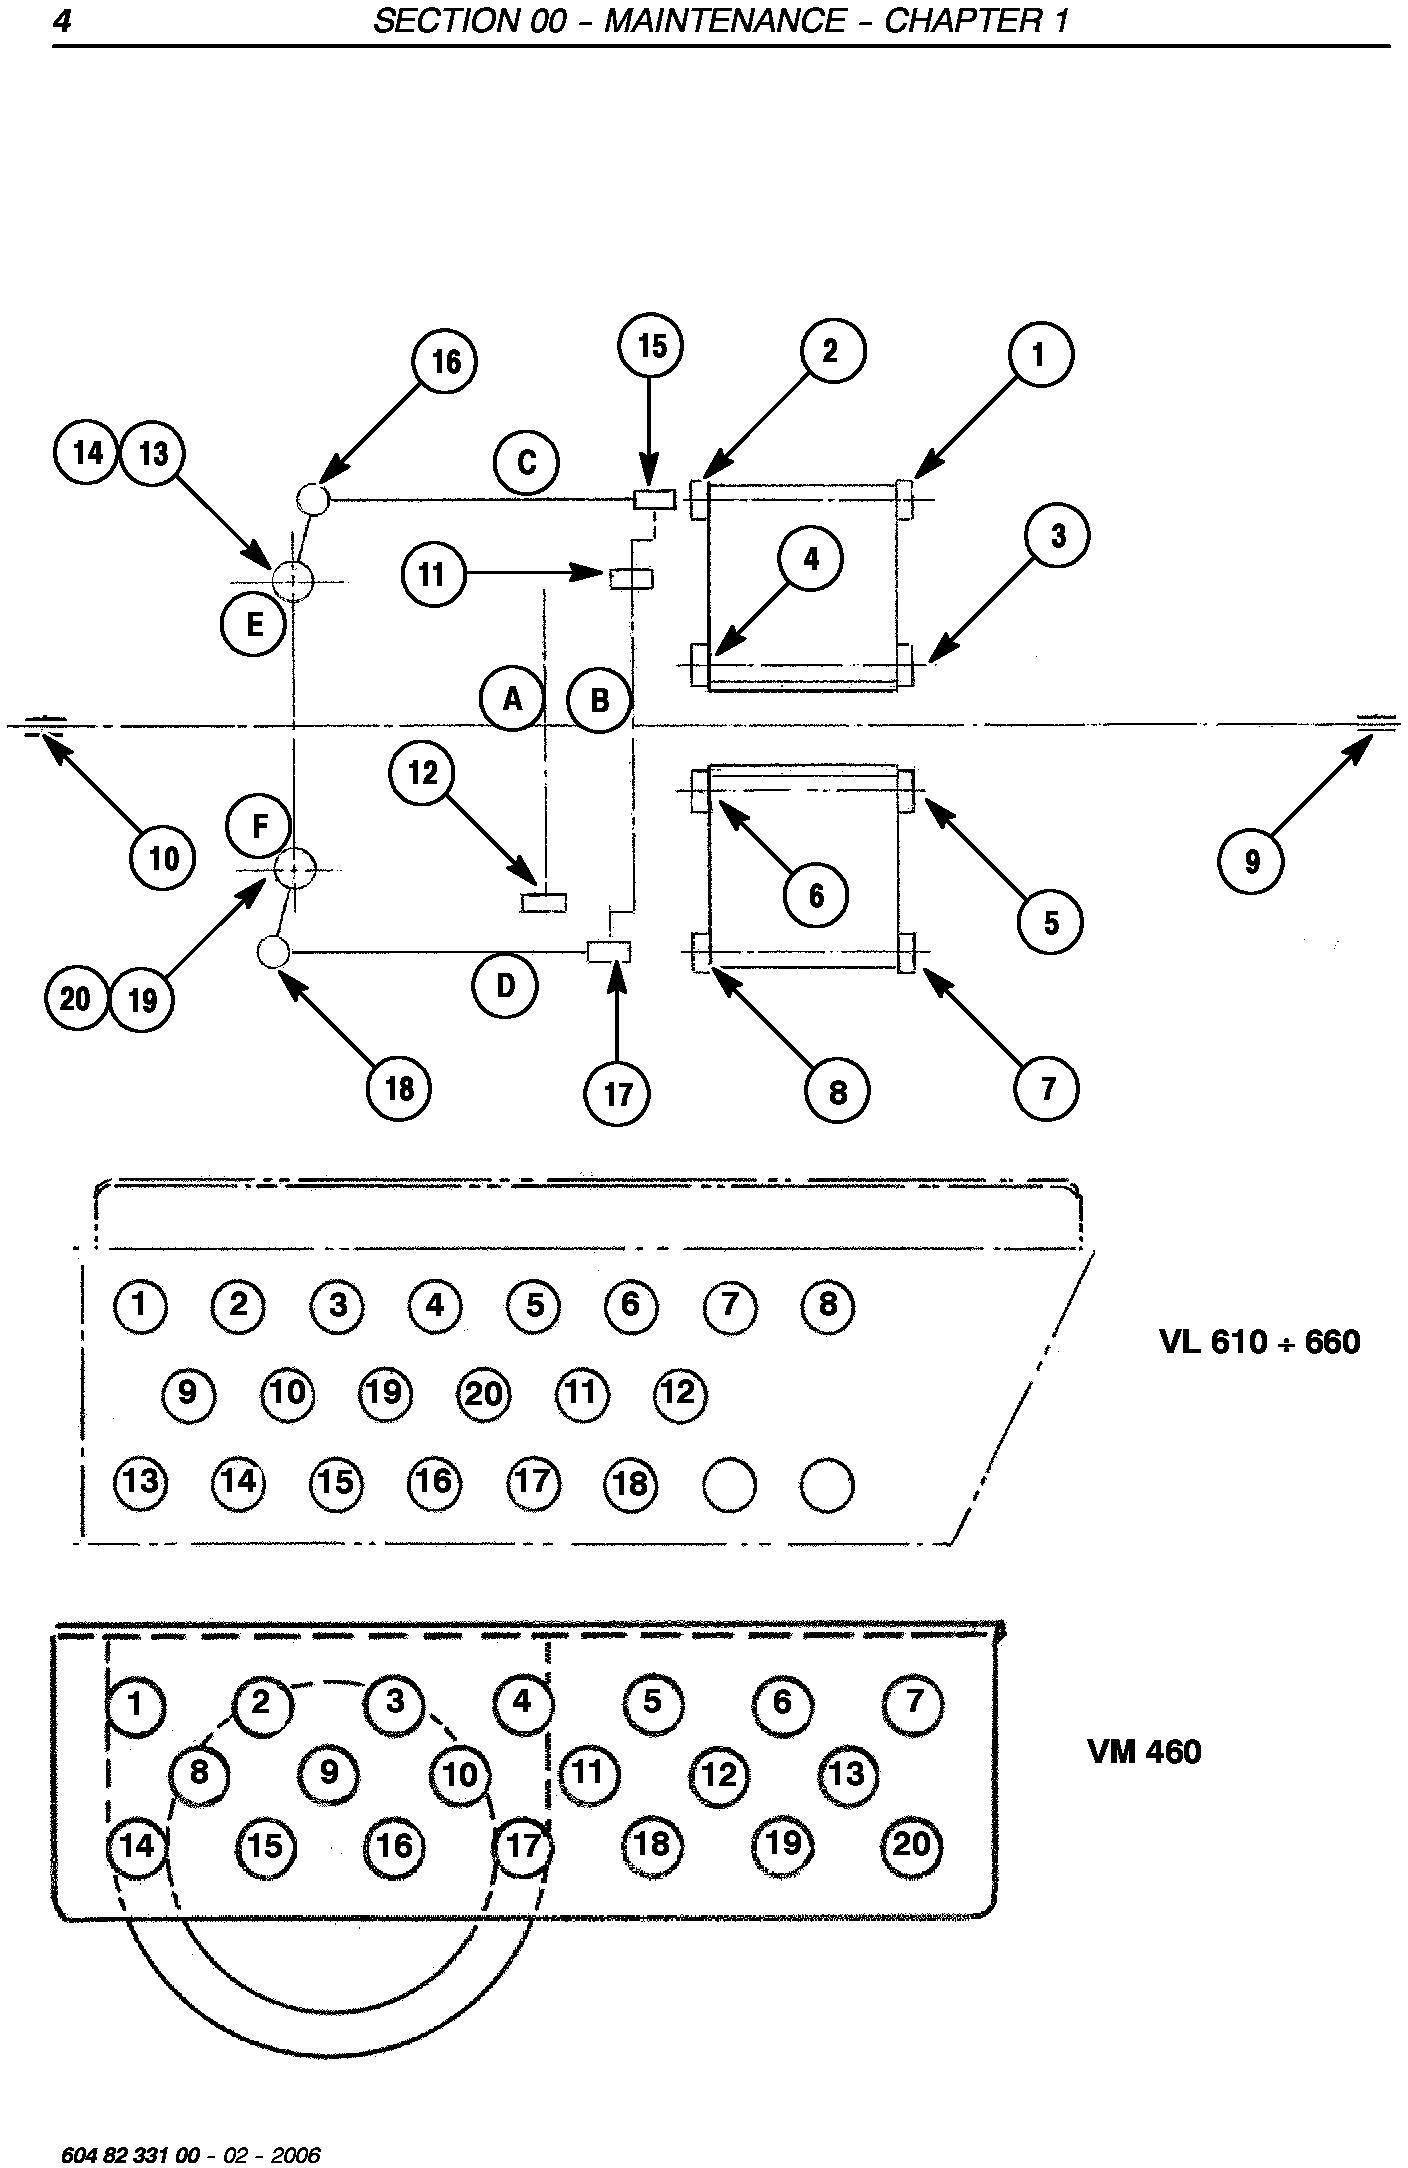 New Holland VL570,VL600,VL610,VL620,VL630,VL640,VL660, VM370,VM460,VN300 Grape Harvester Service Manual - 2